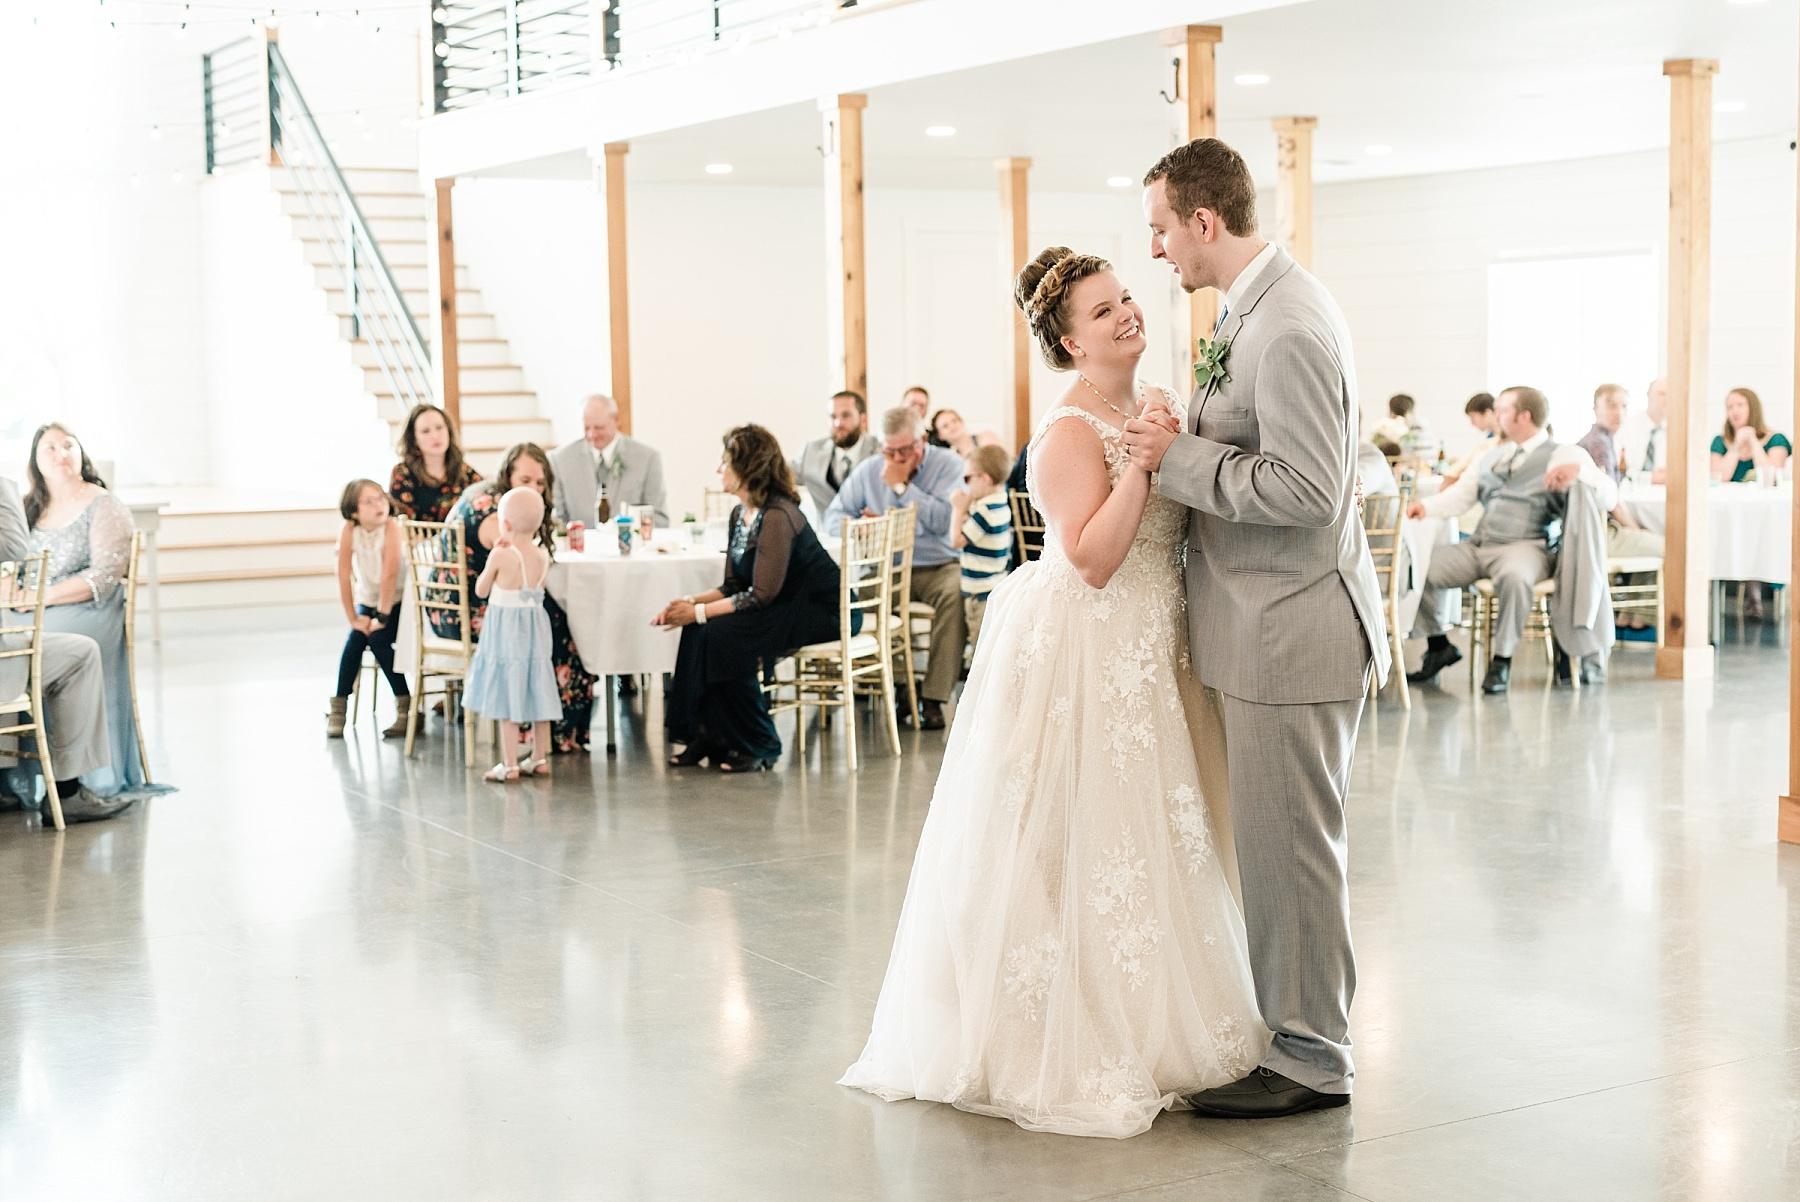 Intimate Summer Wedding at Emerson Fields by Kelsi Kliethermes Photography Best Missouri and Maui Wedding Photographer_0008.jpg